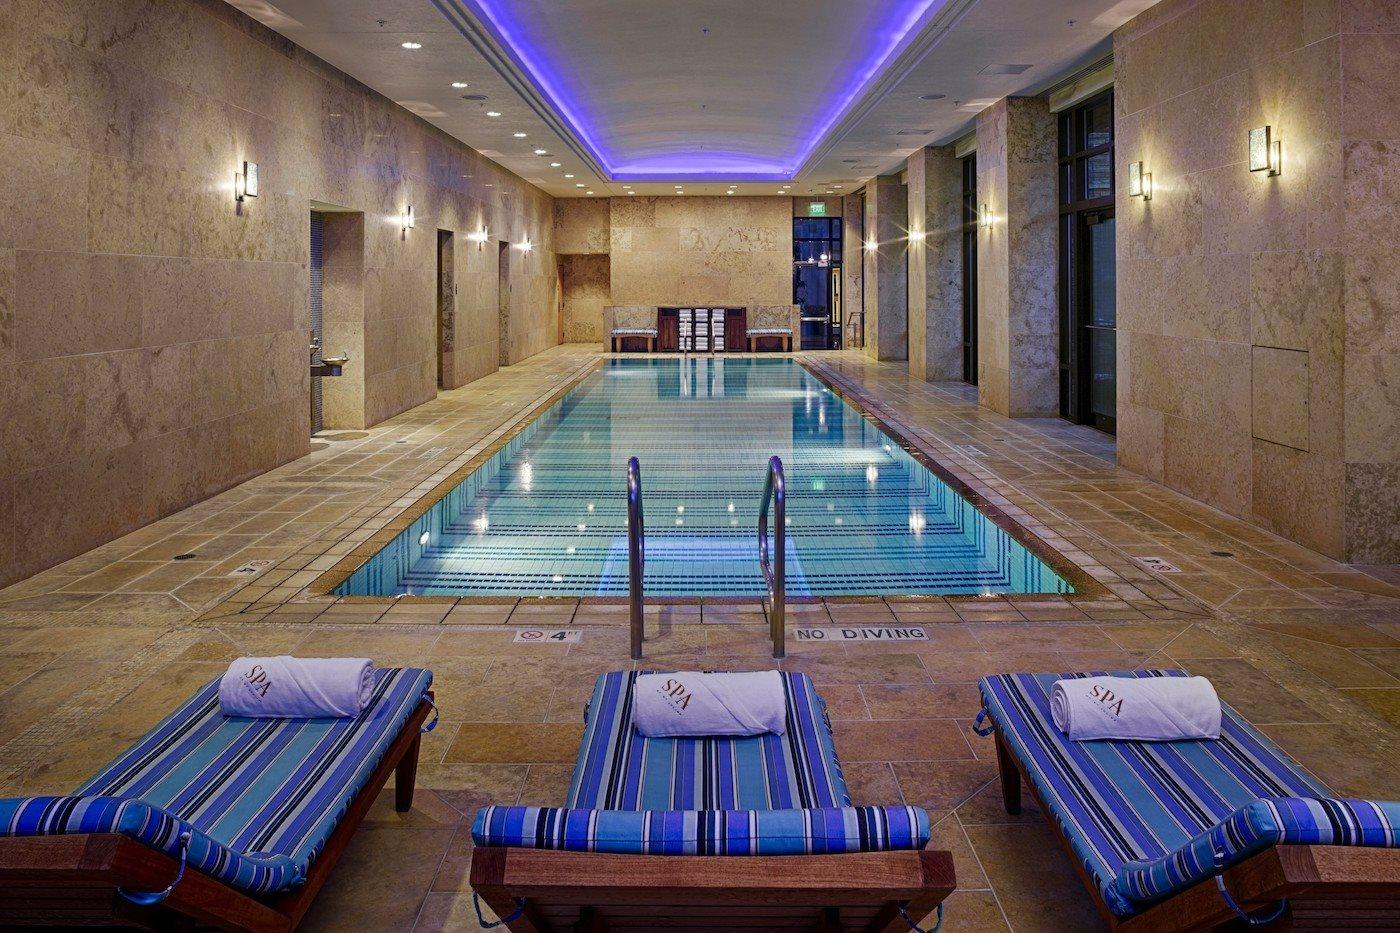 St. Julien Hotel & Spa - Spa Pool